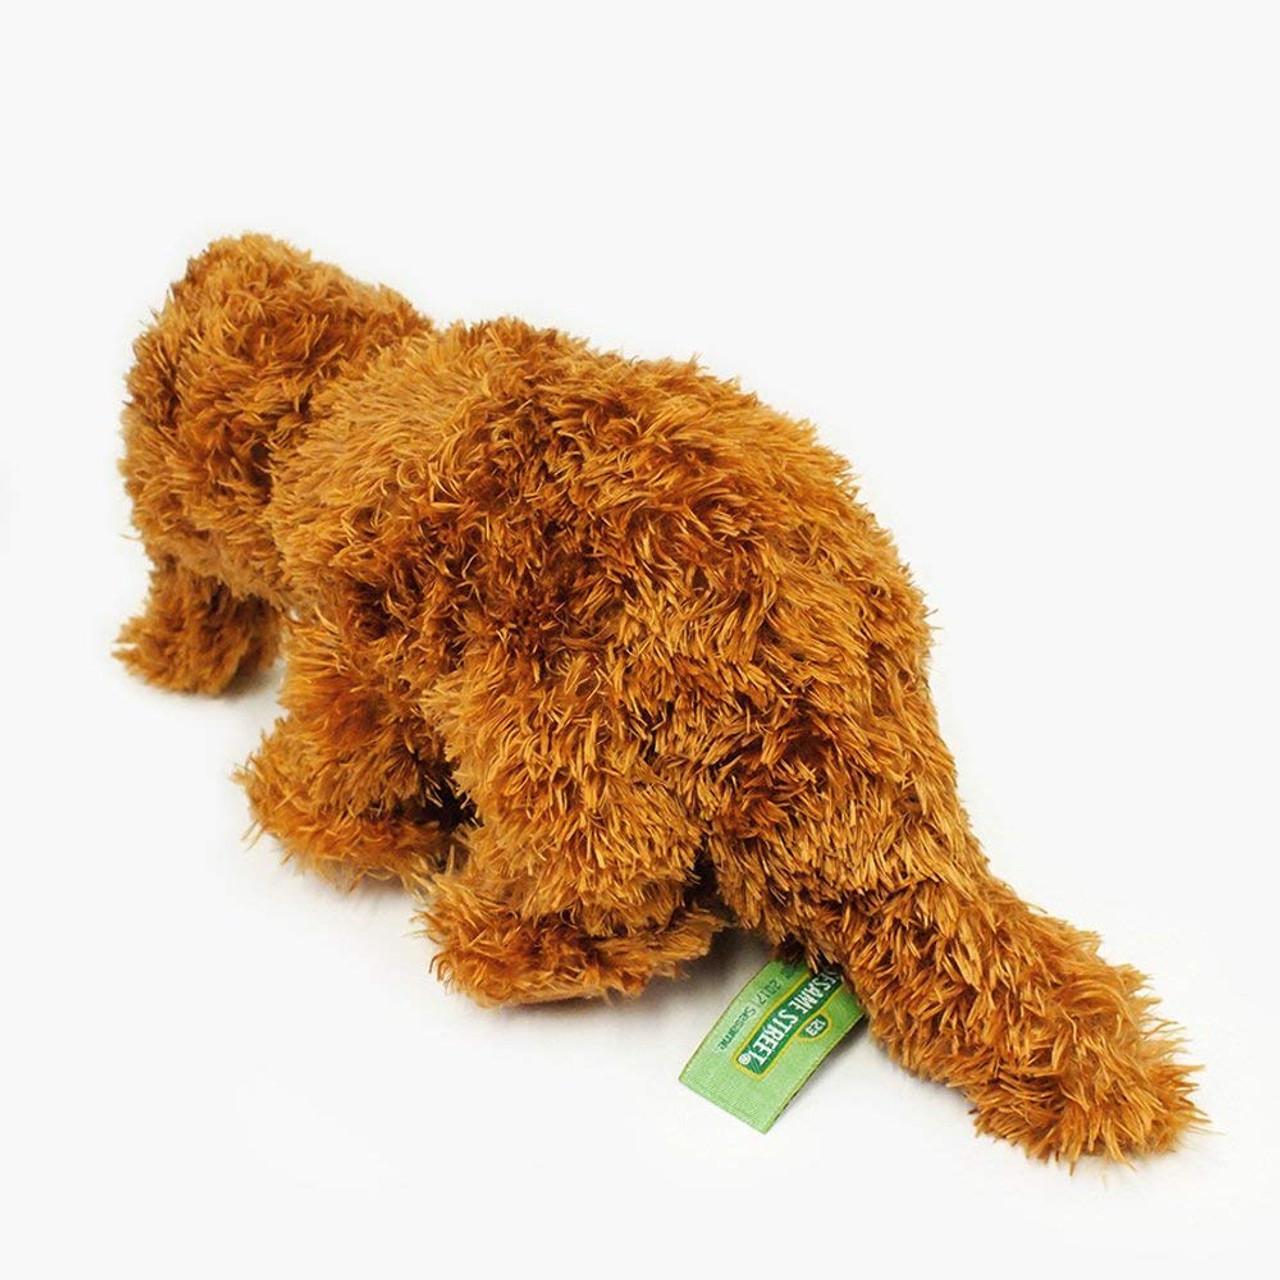 Sesame Street Snuffleupagus Soft Toy 43 cm